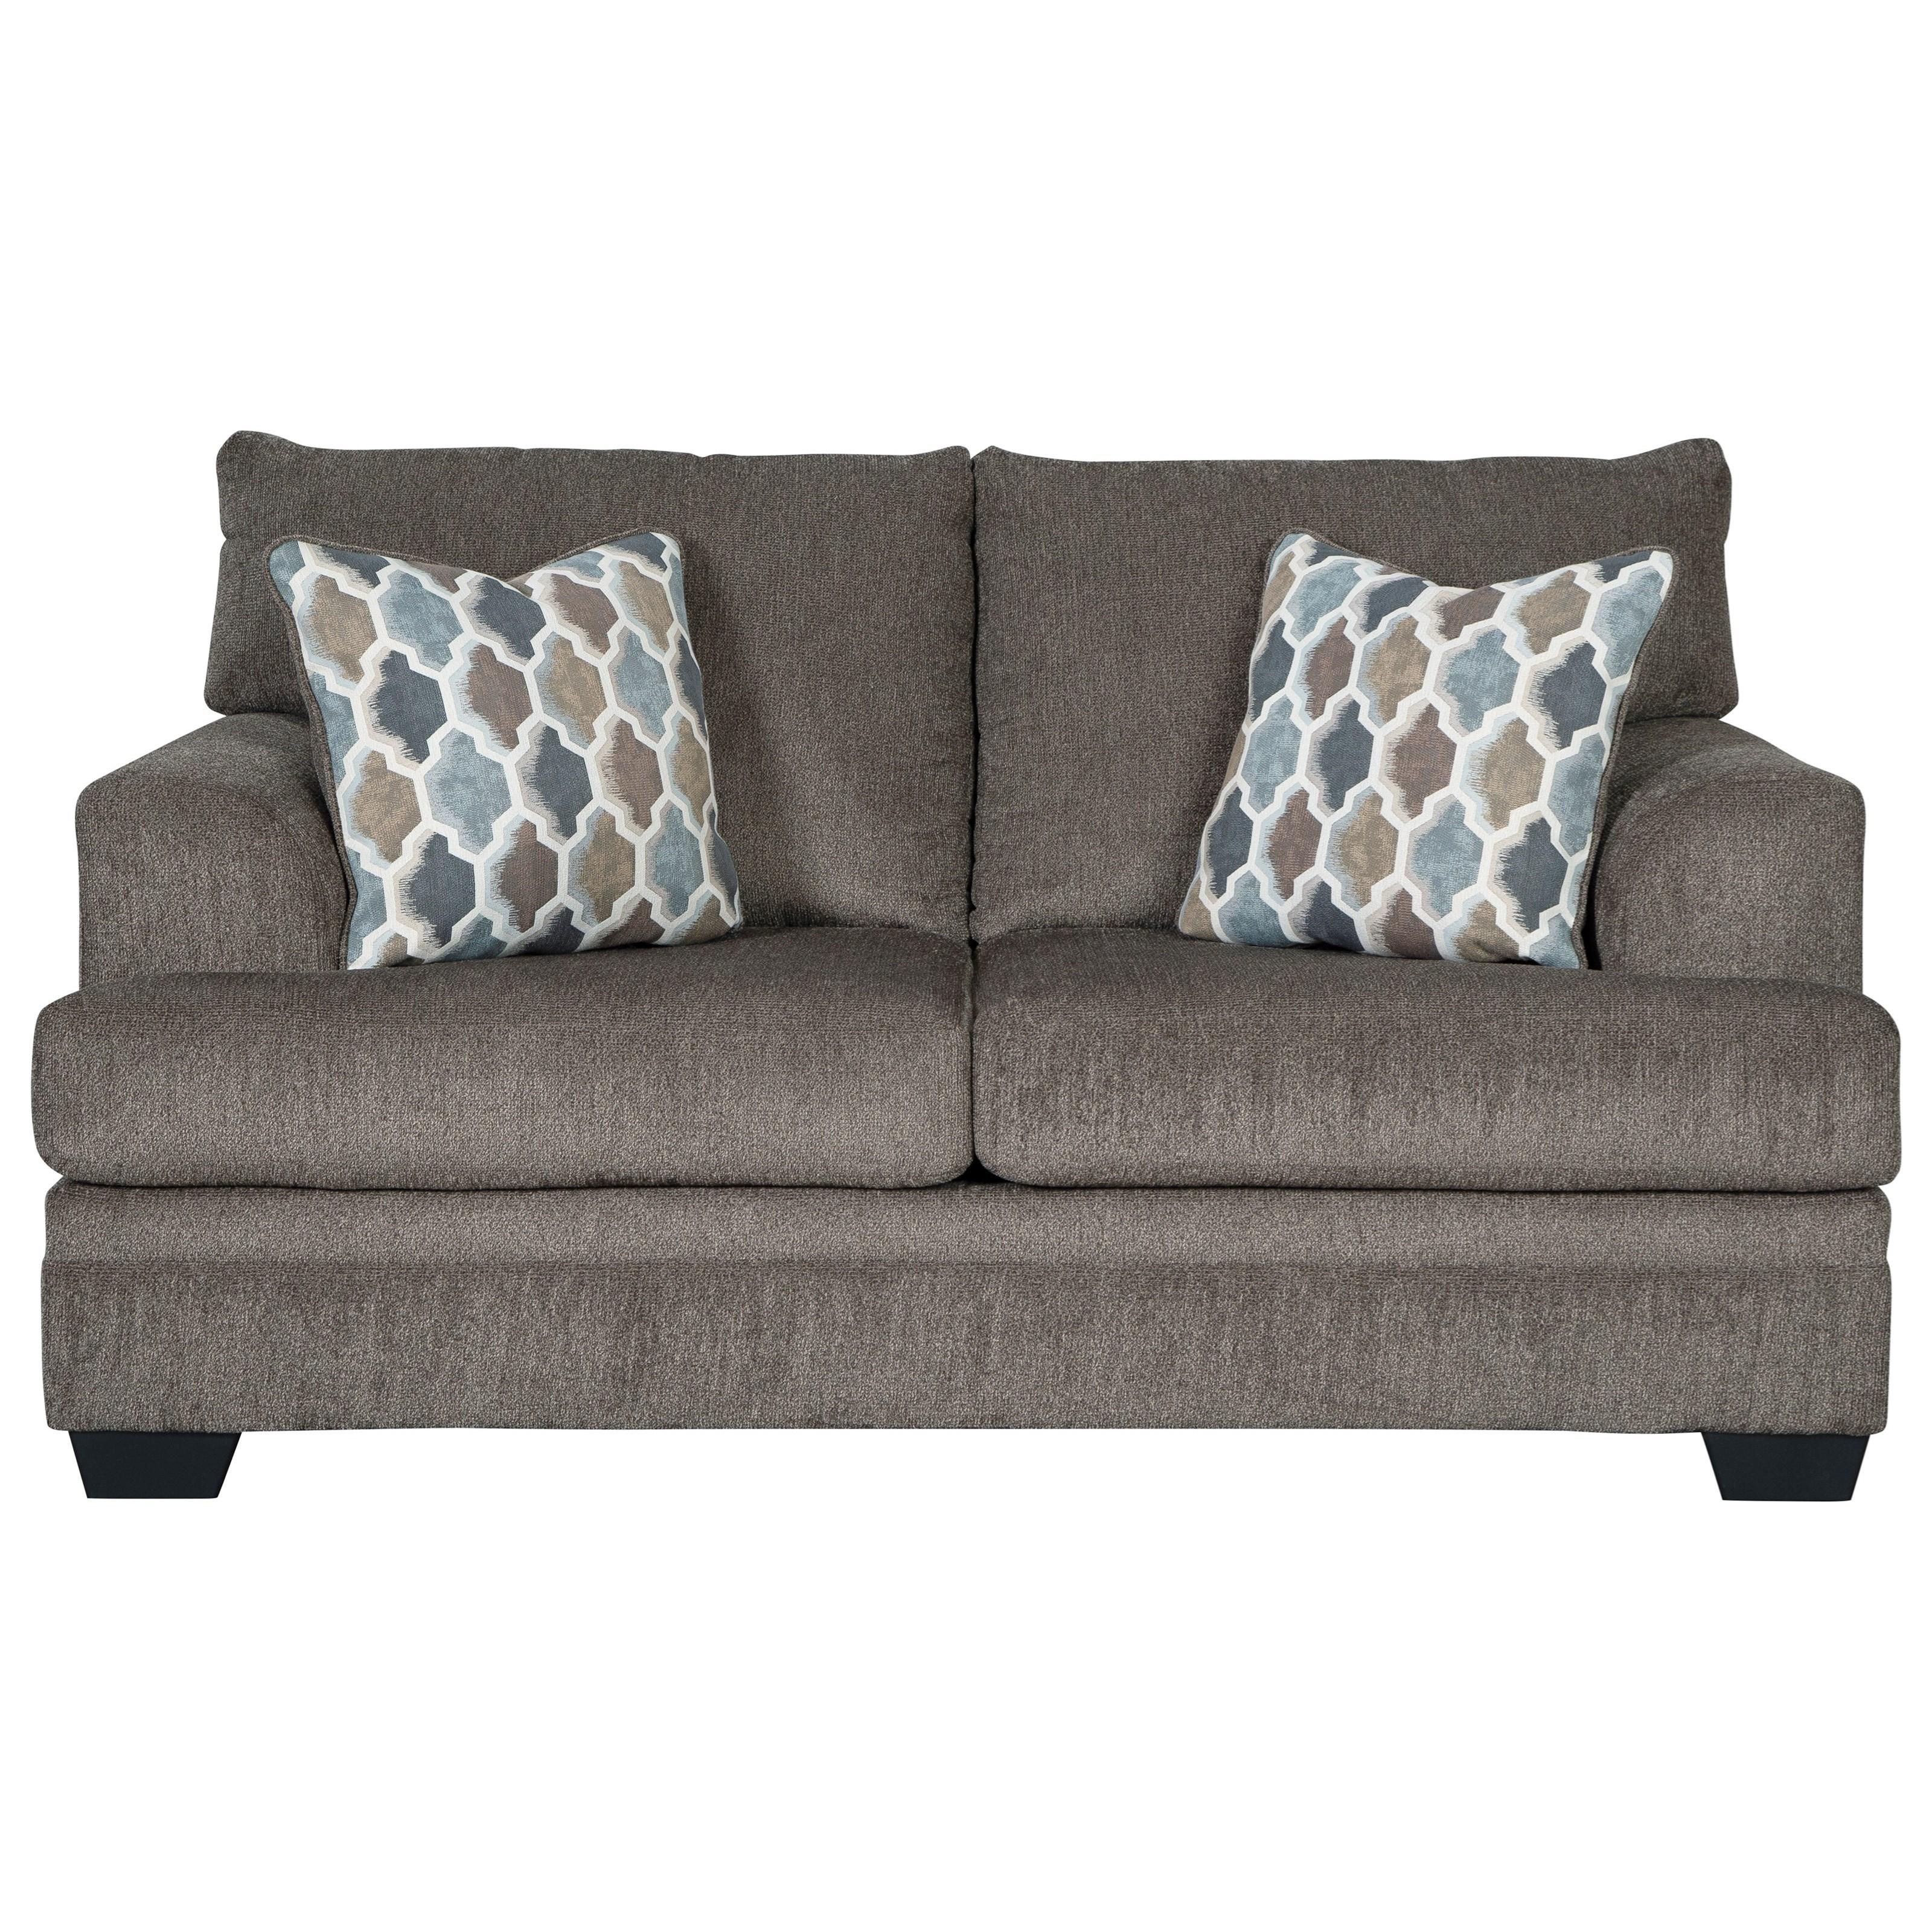 Signature Design By Ashley Dorsten Contemporary Loveseat Royal Furniture Loveseats